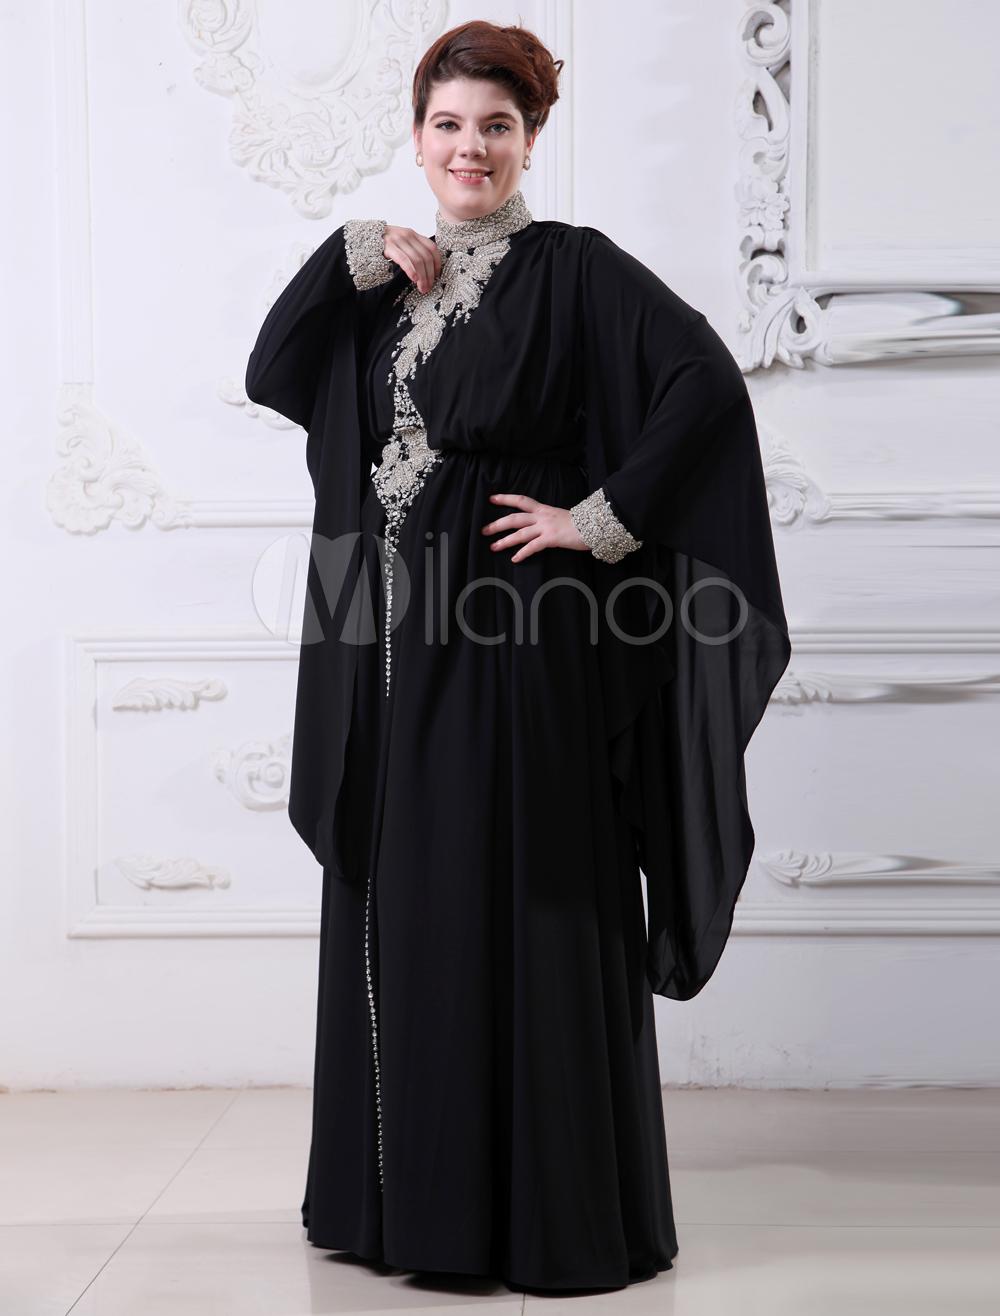 Black High Collar Applique Long Sleeves Chiffon Evening Dress (Wedding Evening Dresses) photo